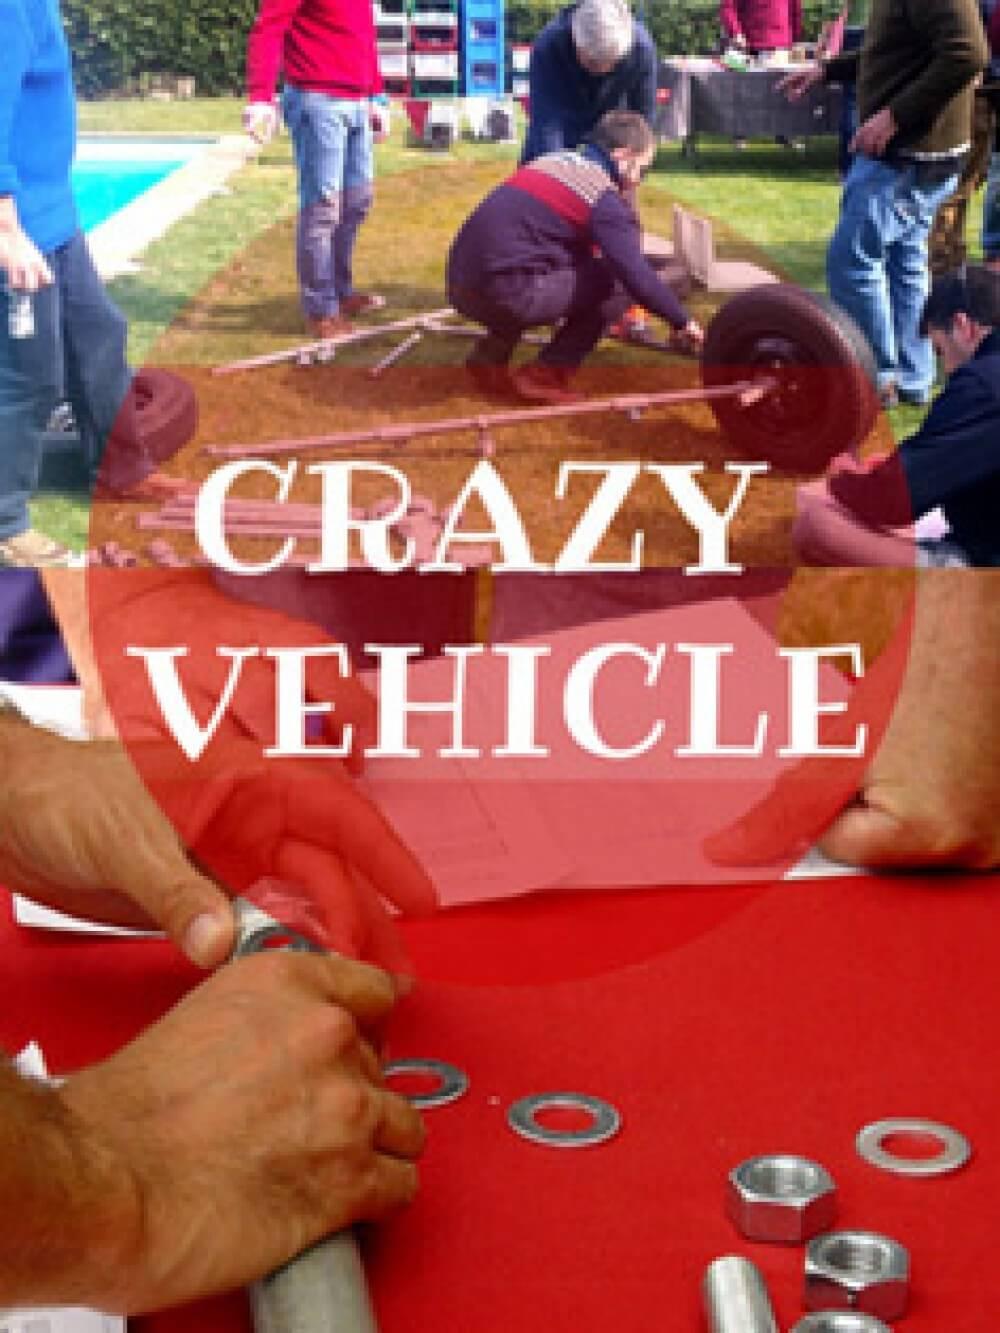 crazy_vehicle_vertical_web